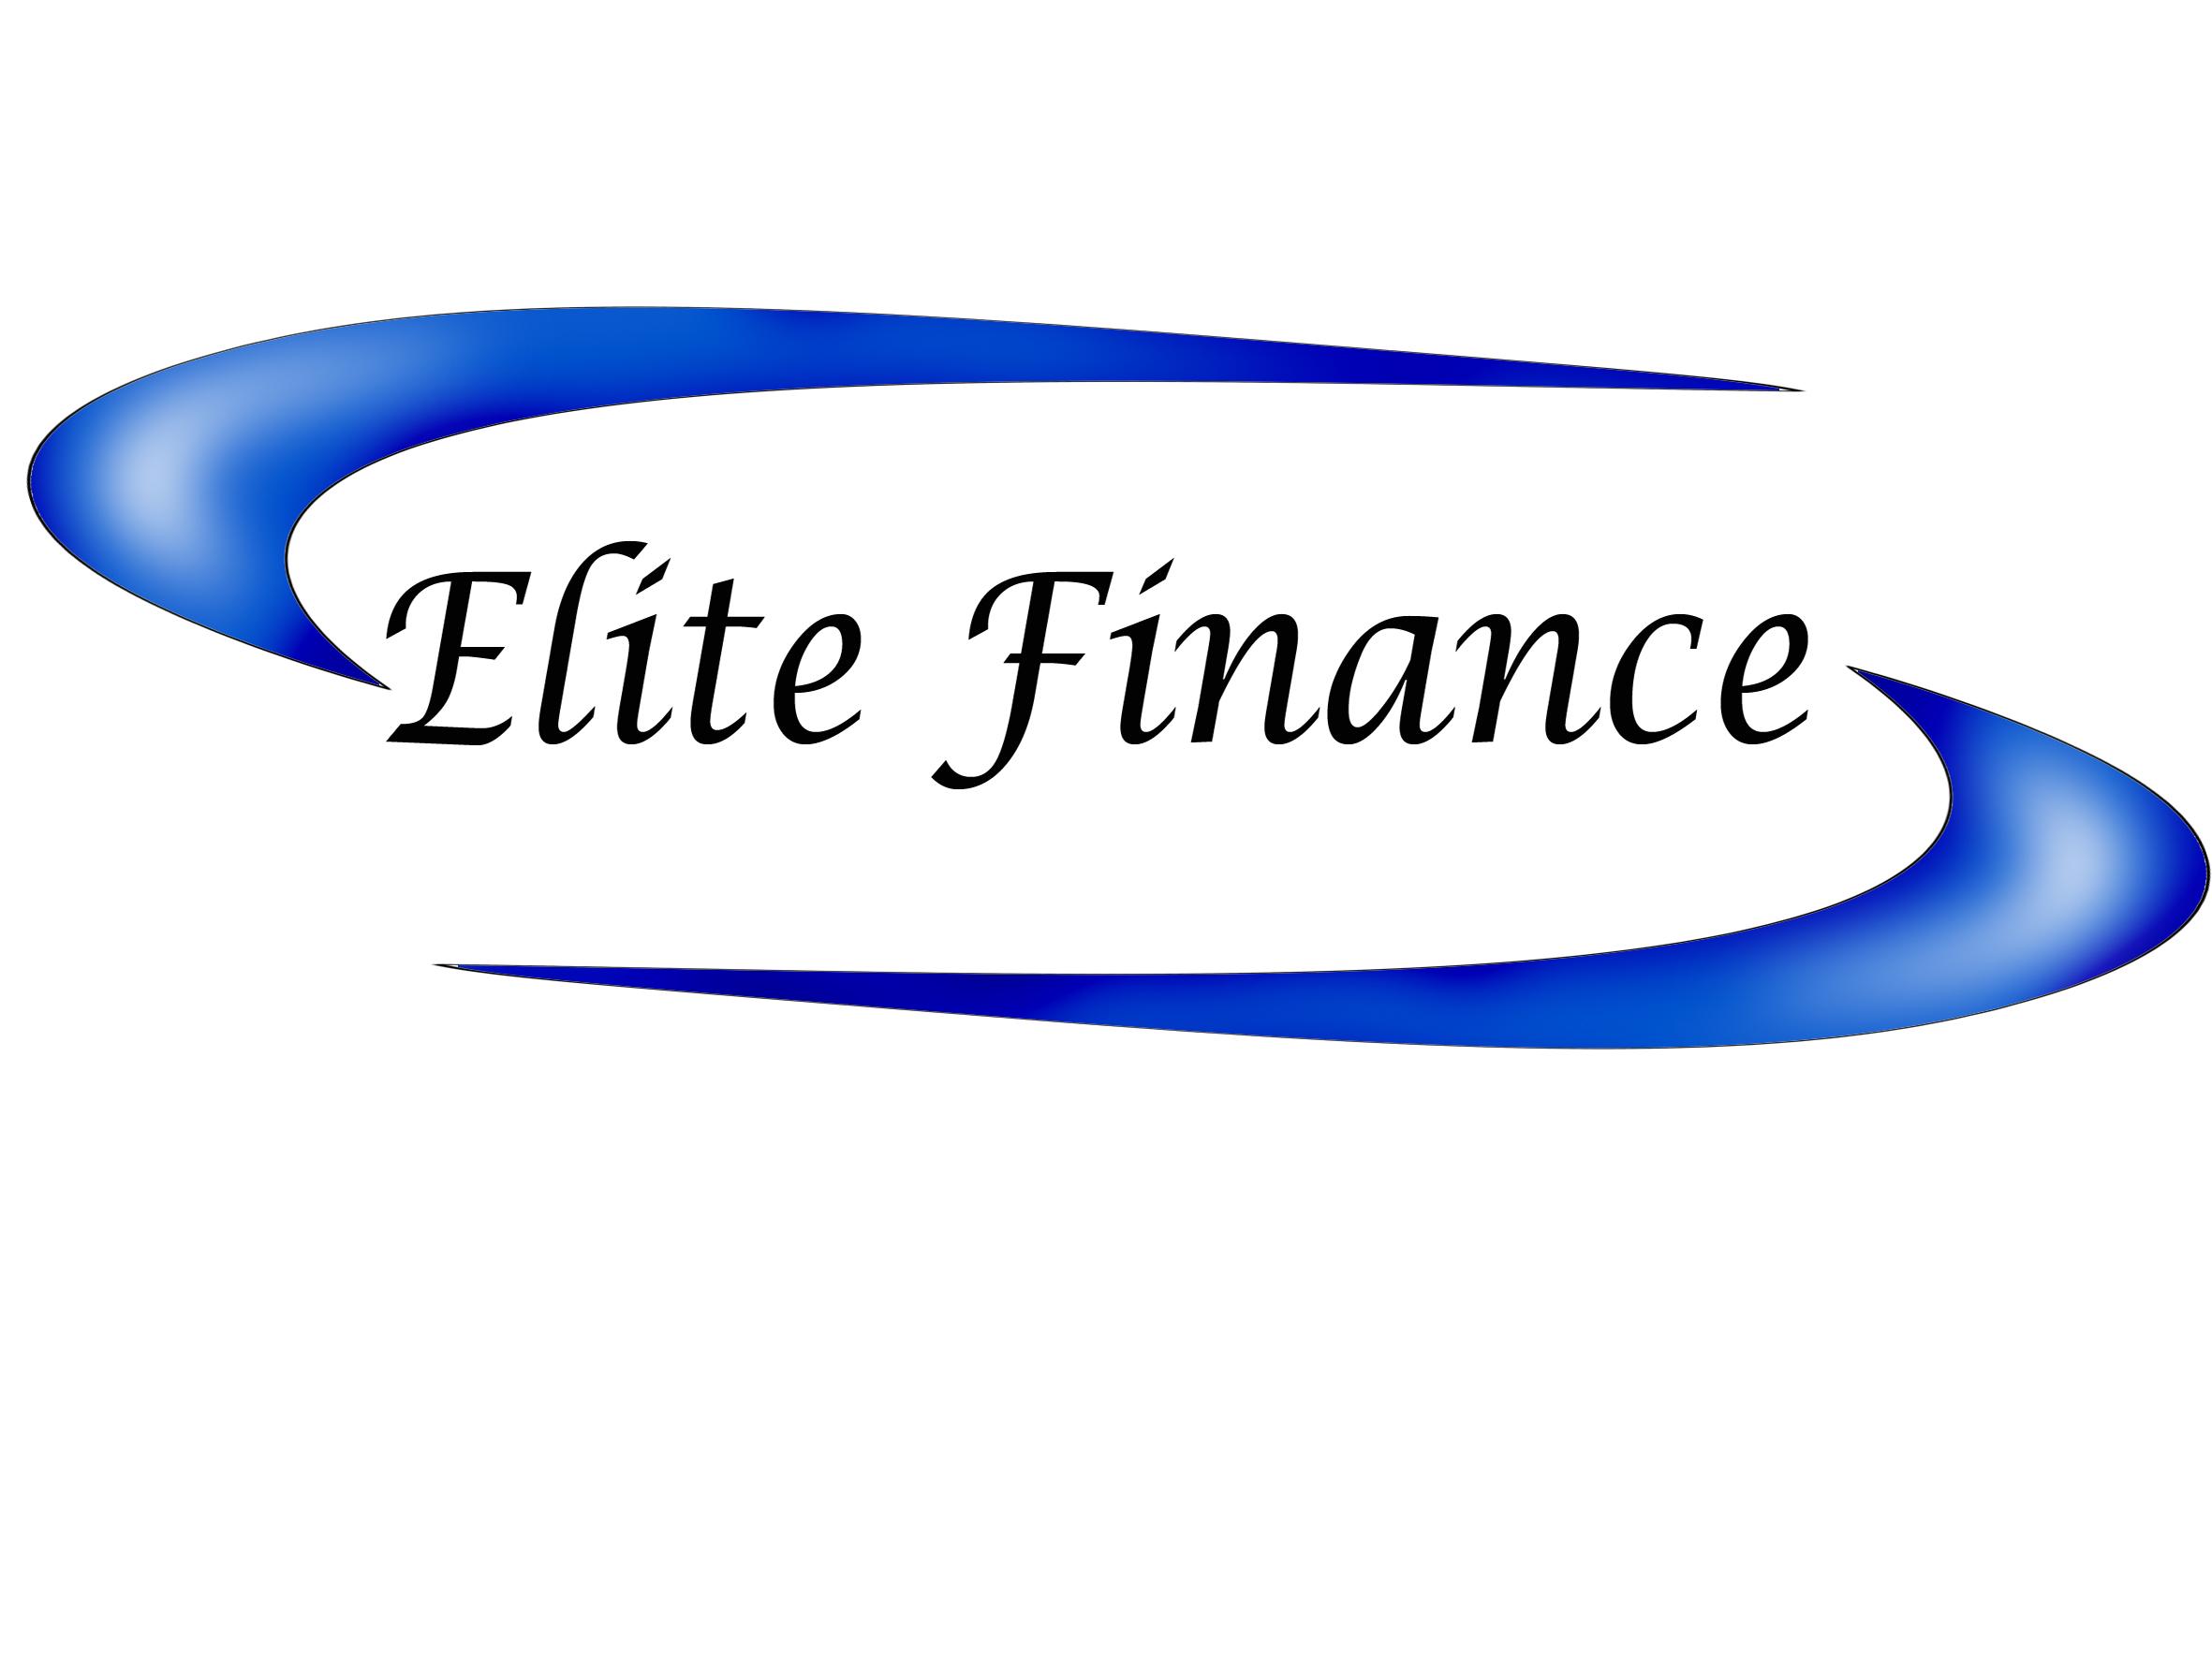 Разработка логотипа компании фото f_4df71a970e0e1.jpg